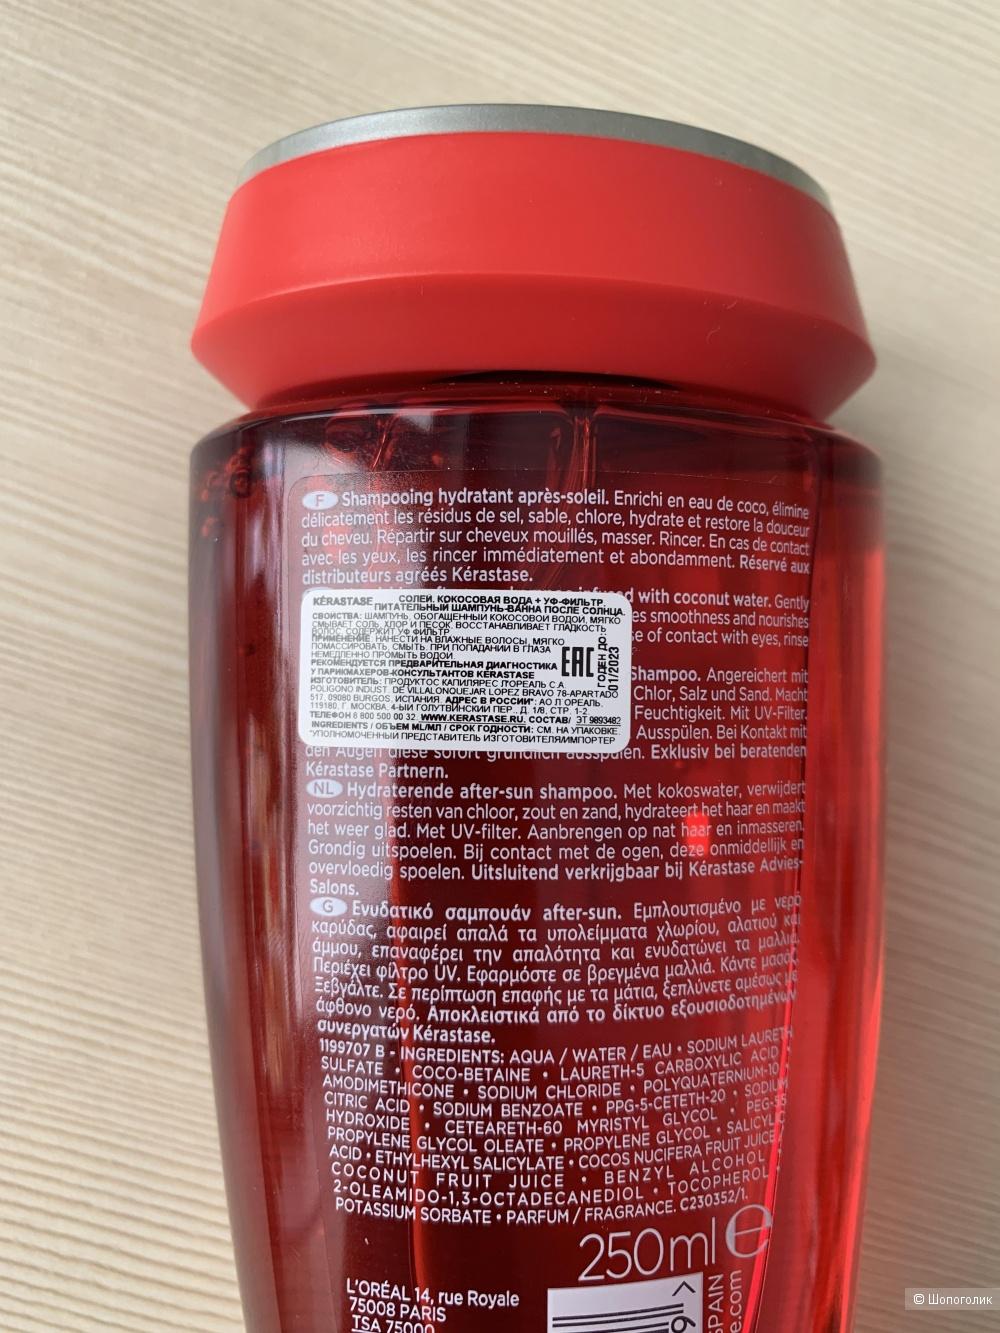 Шампунь Kerastase Soleil, 250 ml